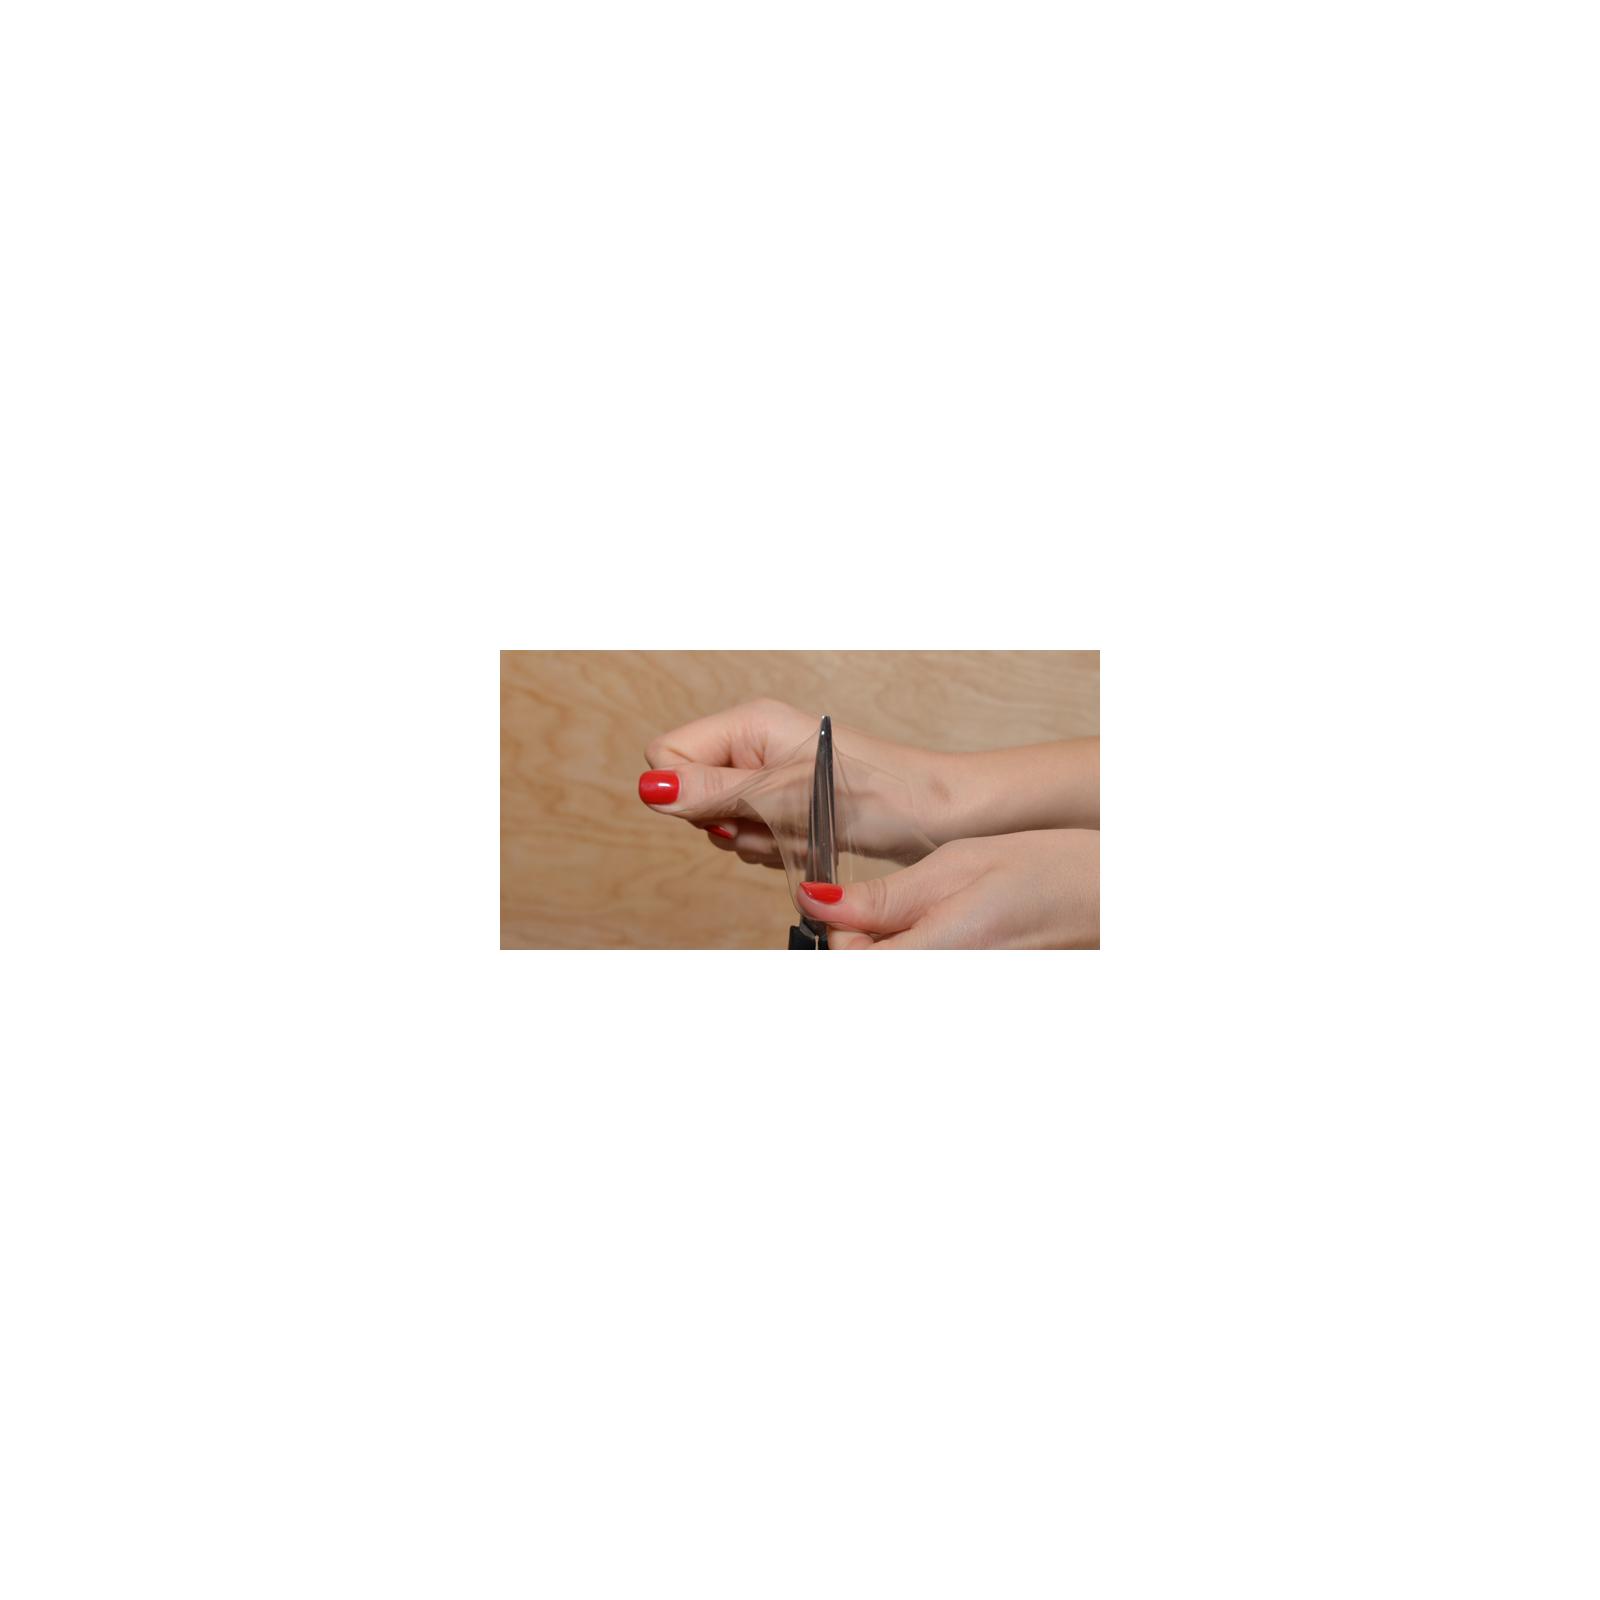 Пленка защитная JINN ультрапрочная Magic Screen для HTC Desire 400 (HTC Desire 400 front+back) изображение 4